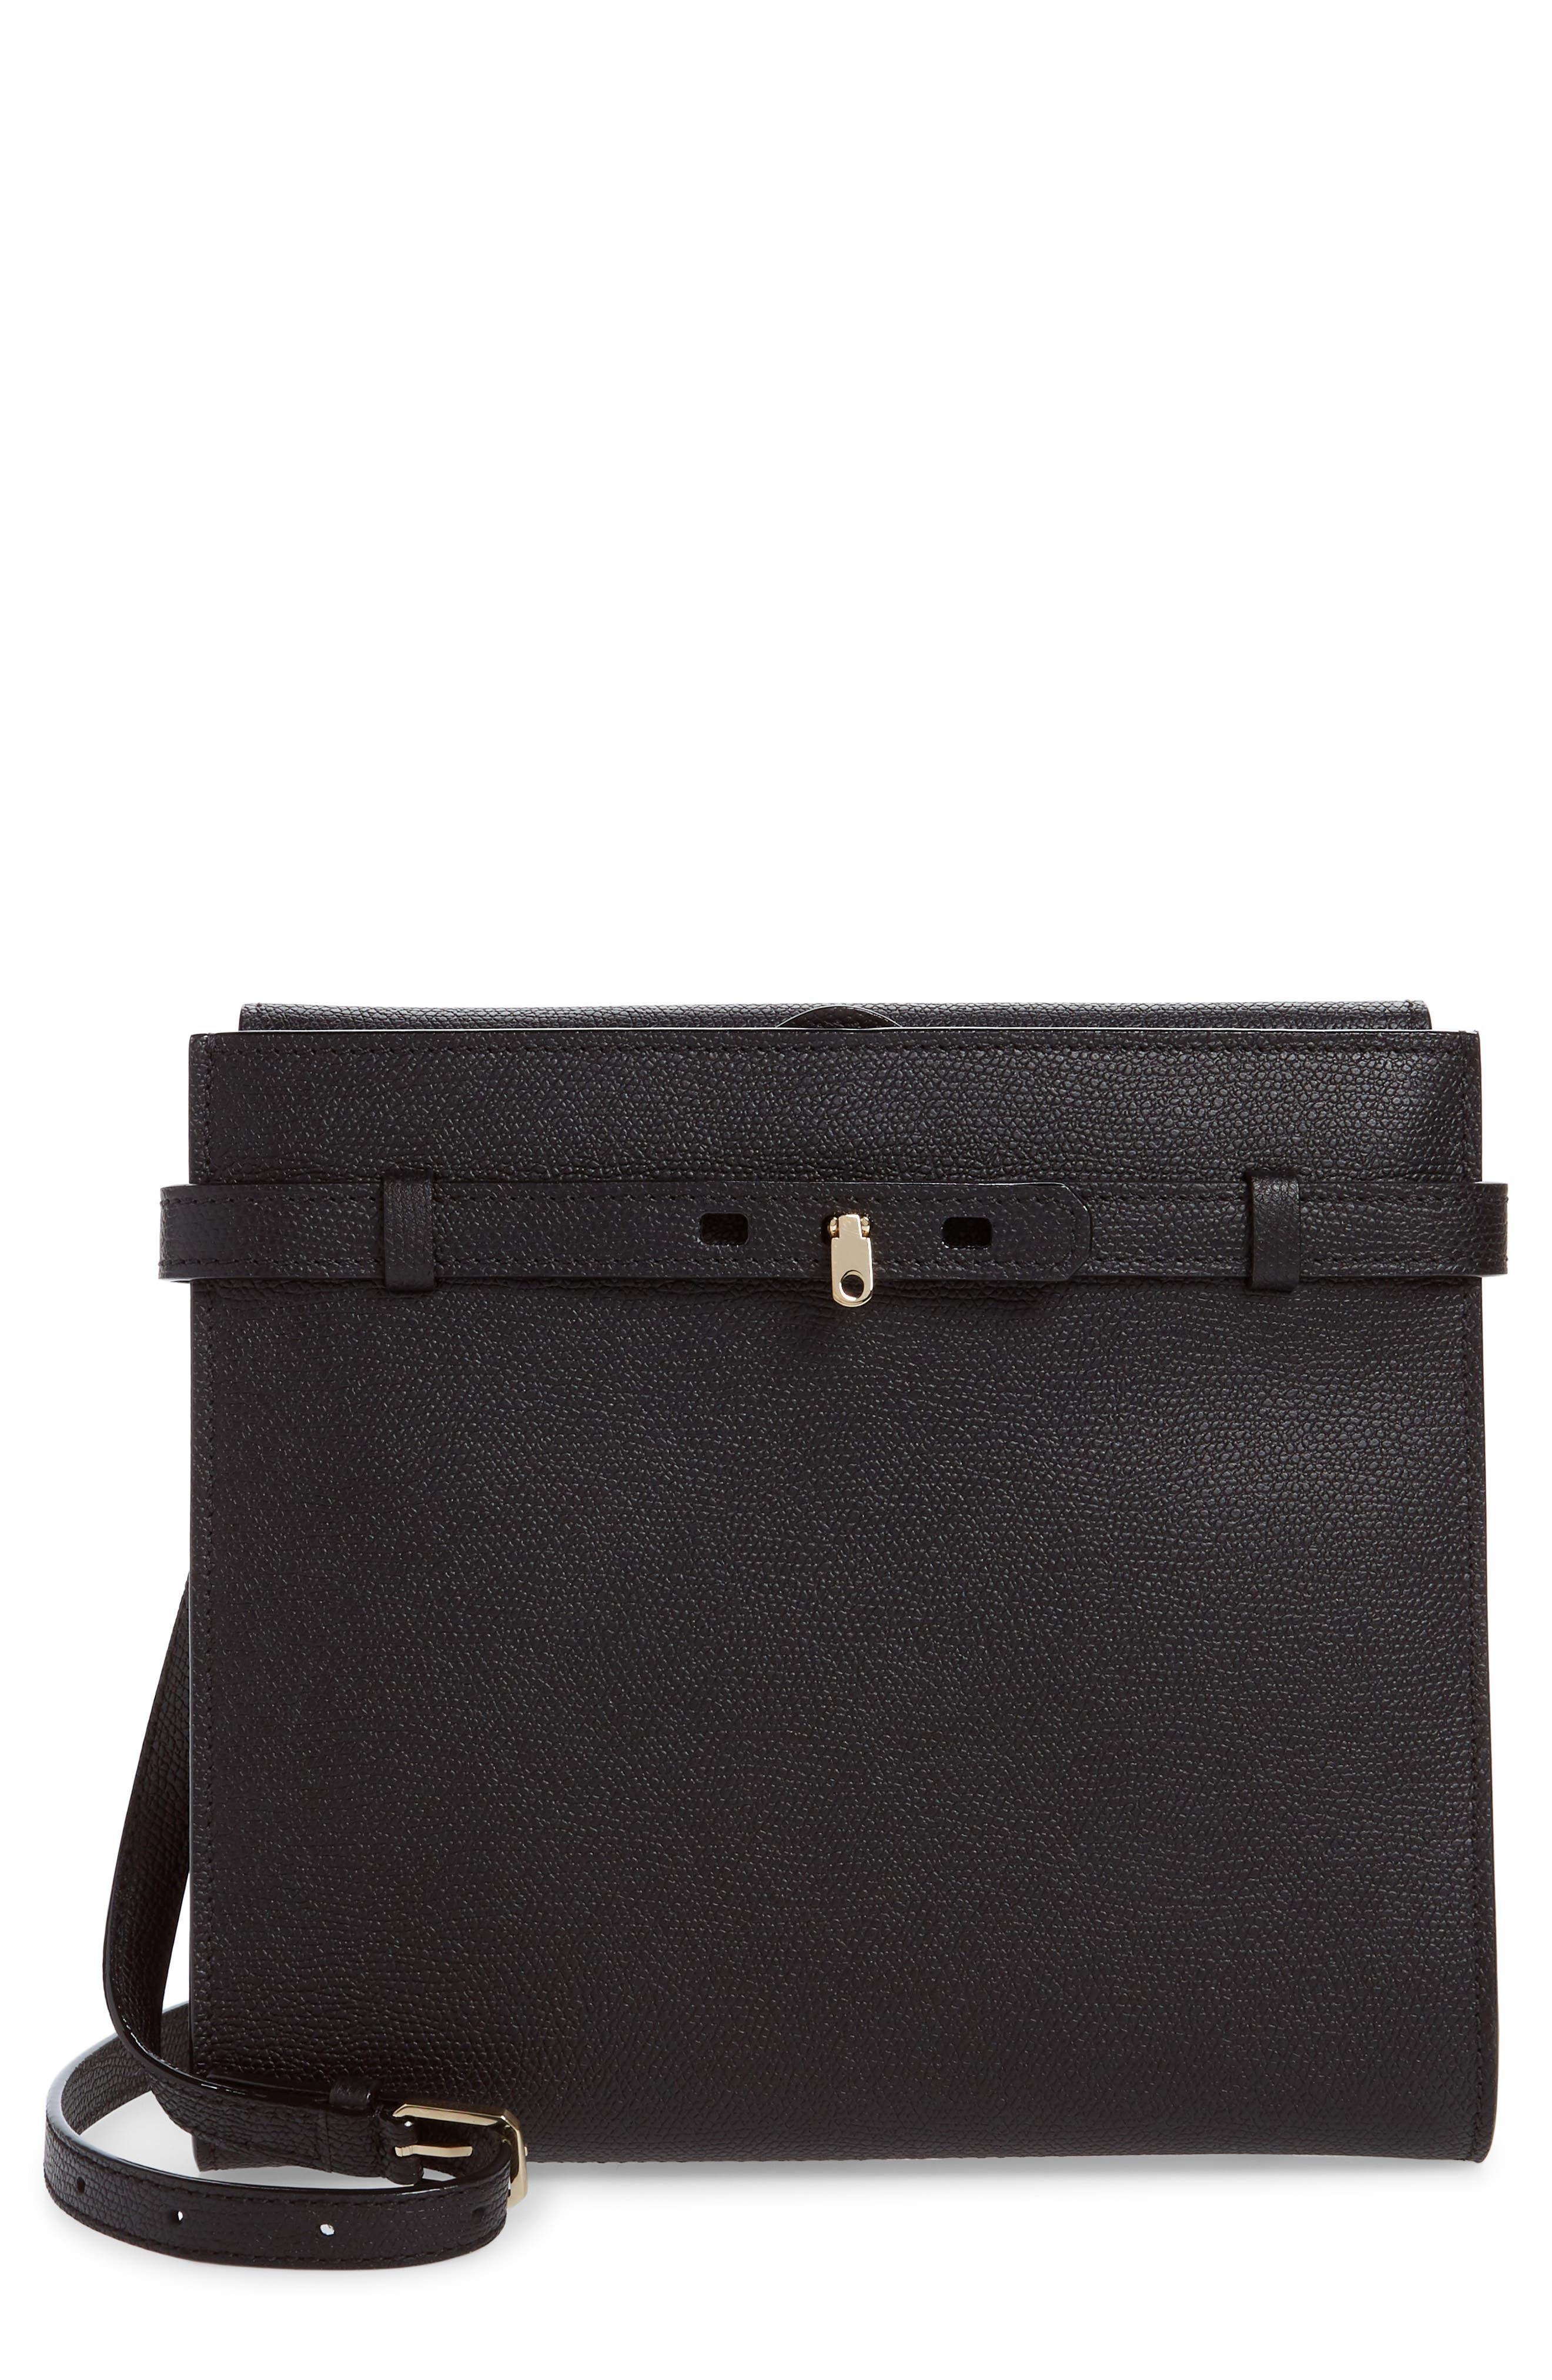 Valextra Medium B-Tracollina Leather Shoulder Bag/Clutch   Nordstrom